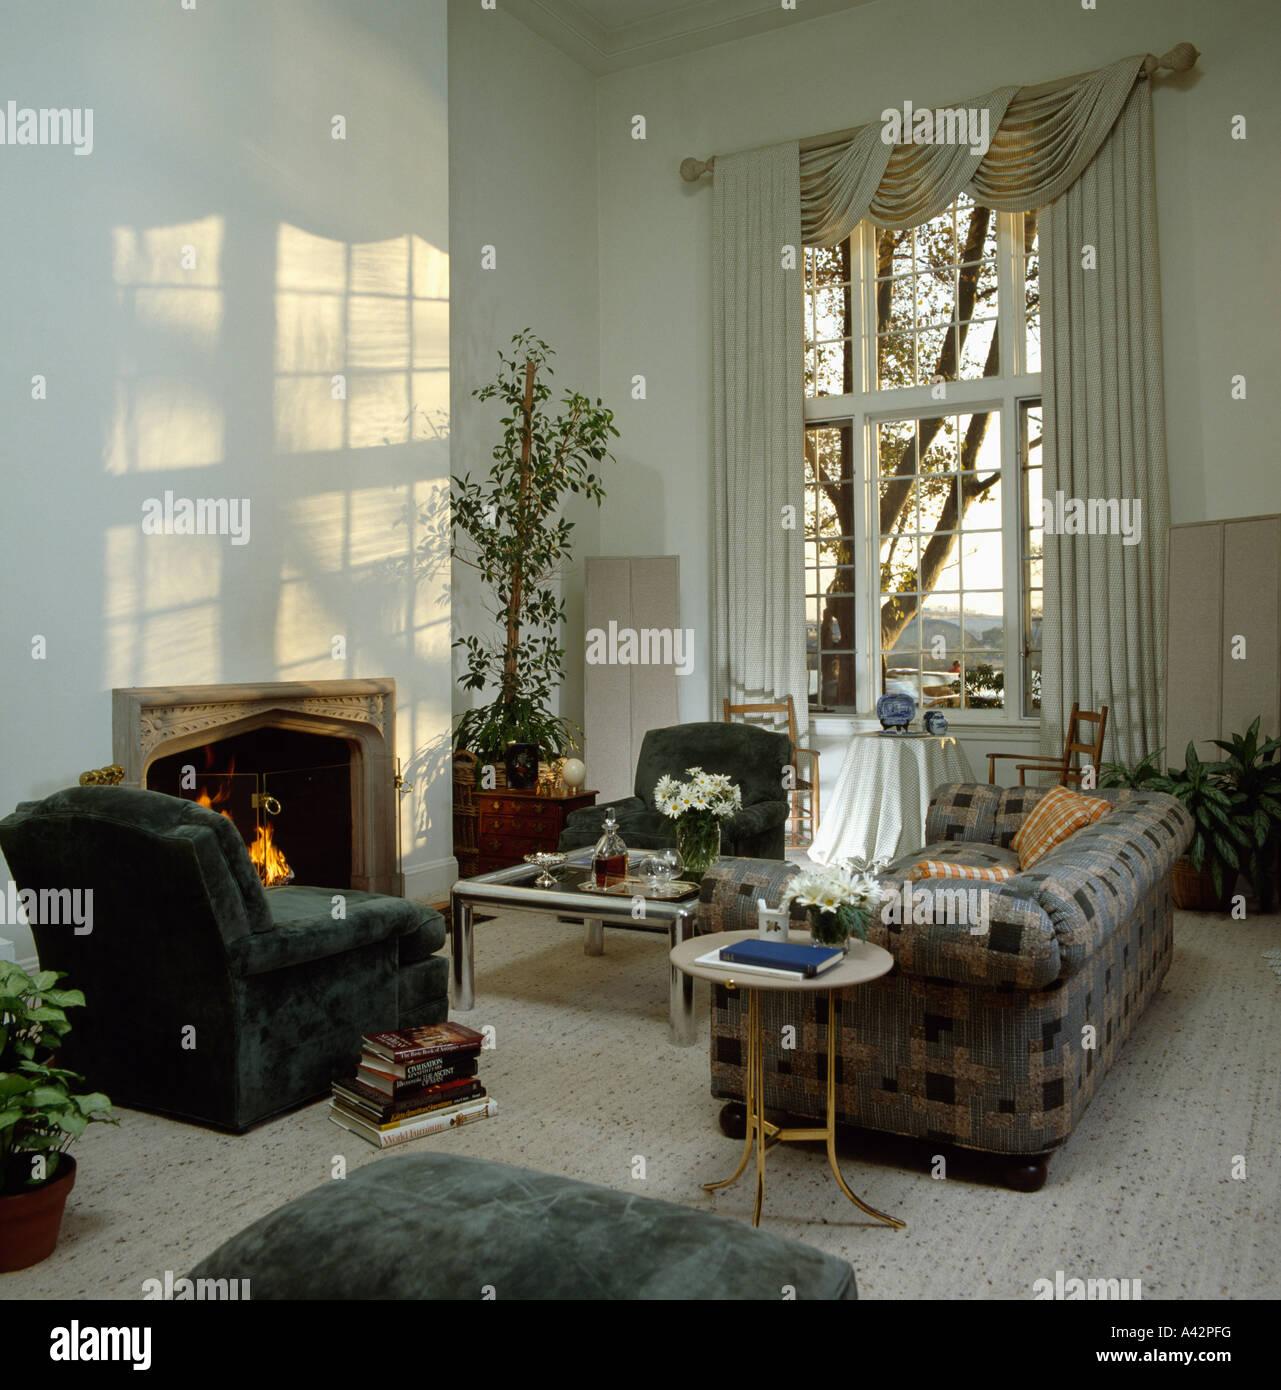 gartenhaus kamin bauen cheap gartenlaube selber bauen. Black Bedroom Furniture Sets. Home Design Ideas